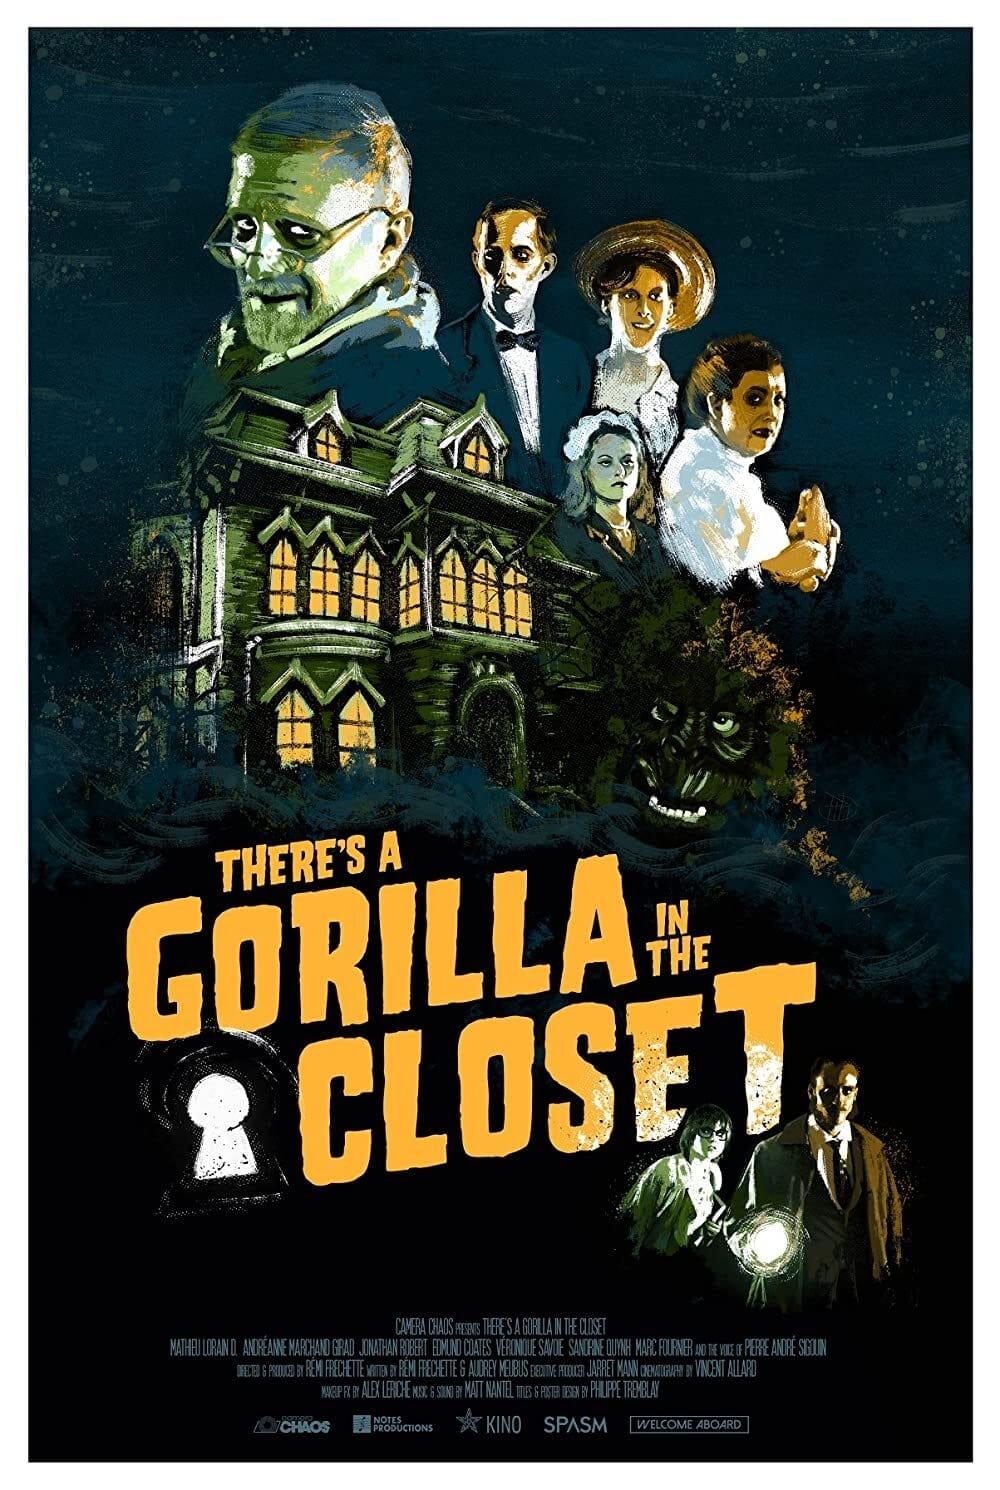 There's a Gorilla in the Closet